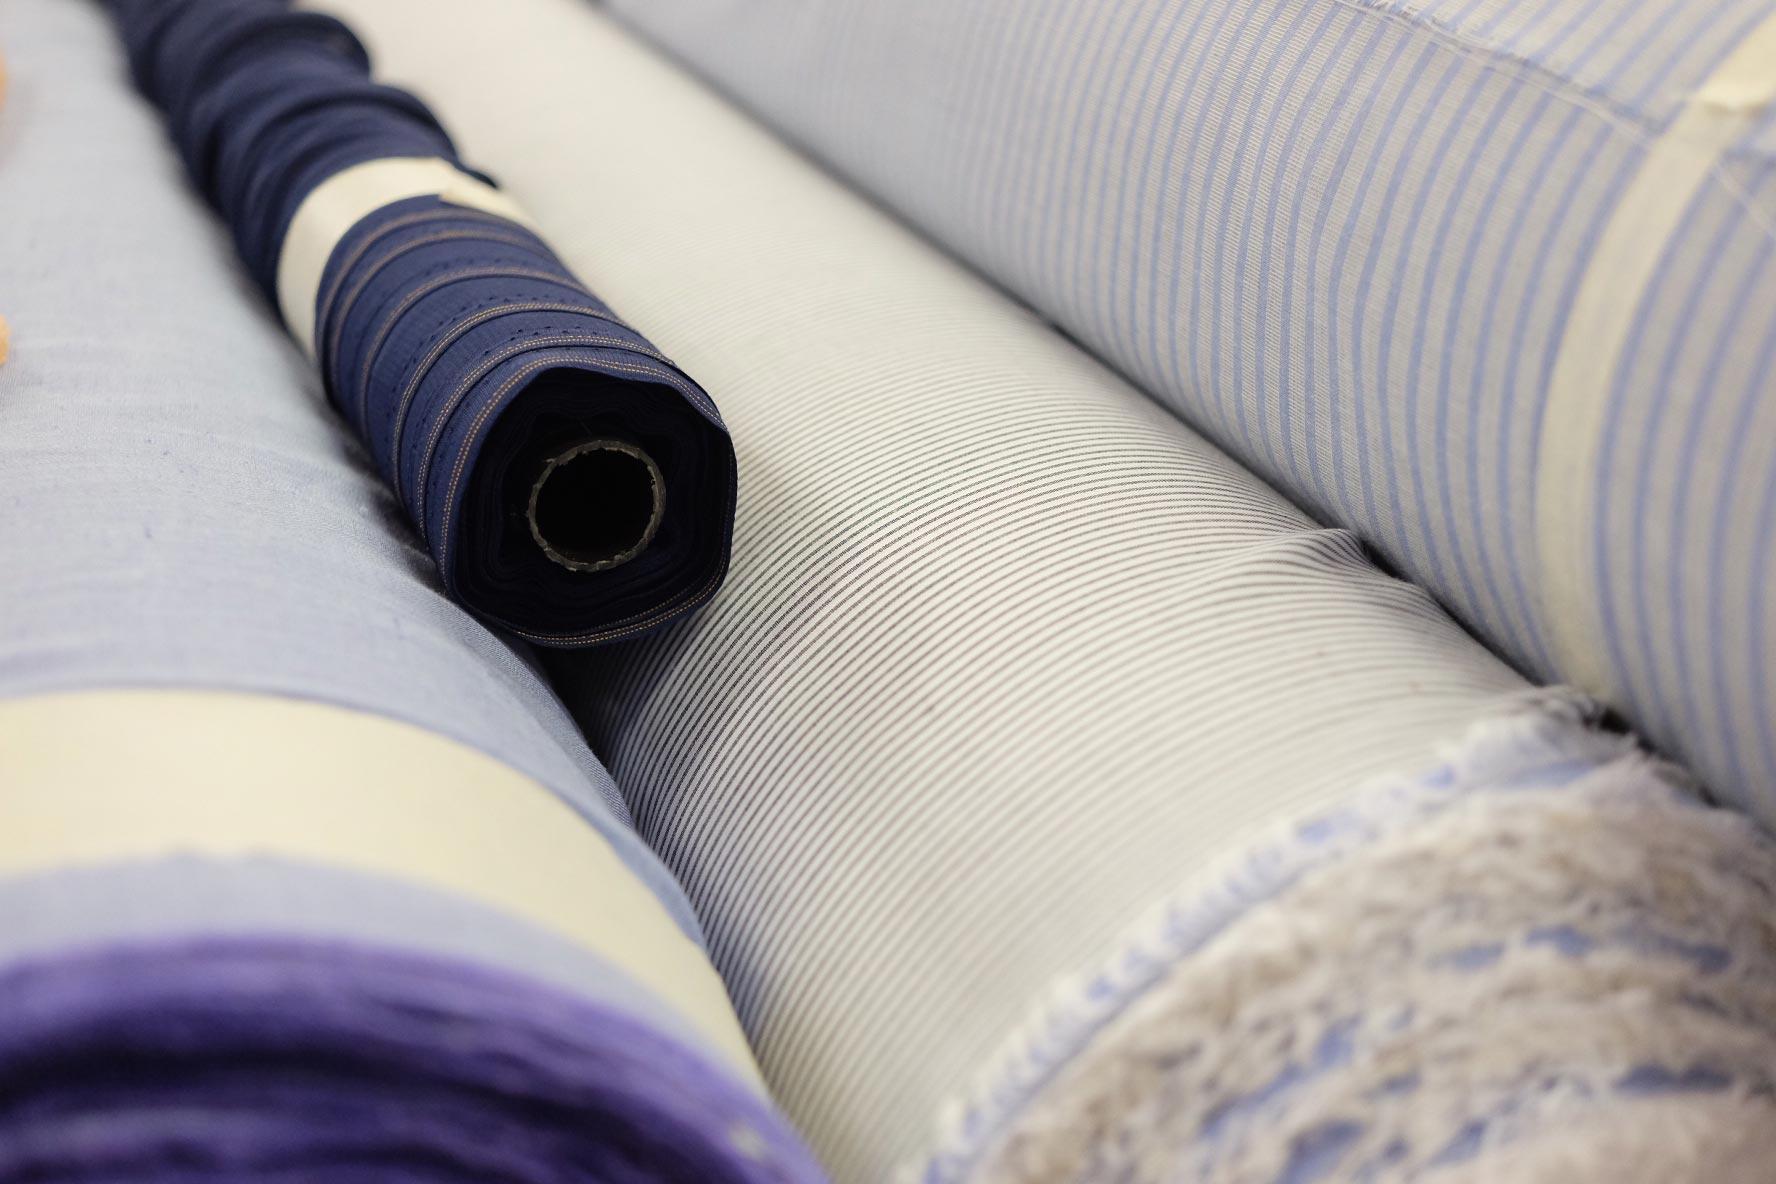 3-eco-fabrics-a4be6ecc87772c02d1ce38bcfb01b068.jpg